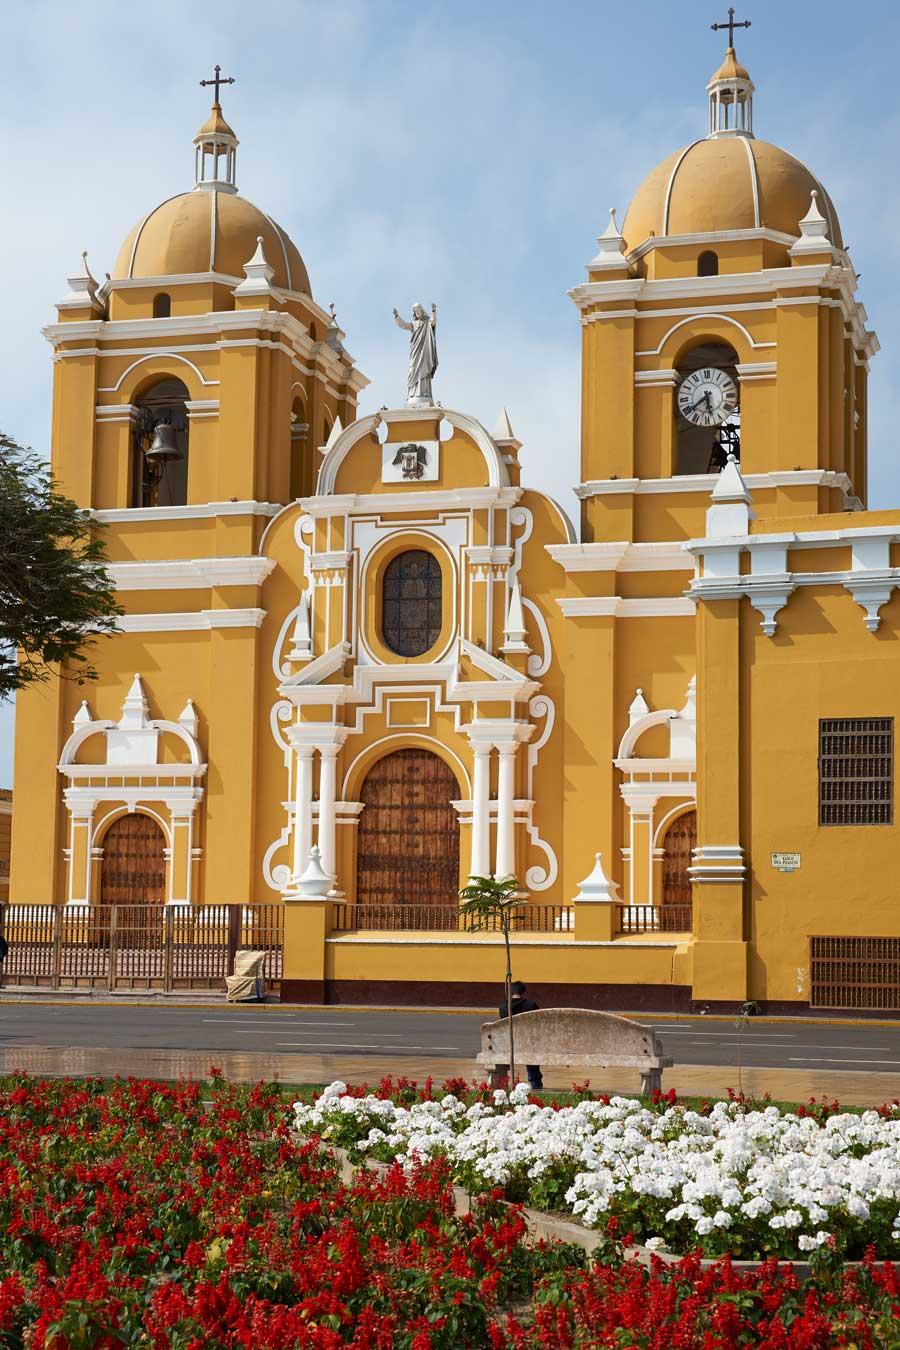 kuoda-blog-why-trujillo-destination-visit-2017-3.jpg